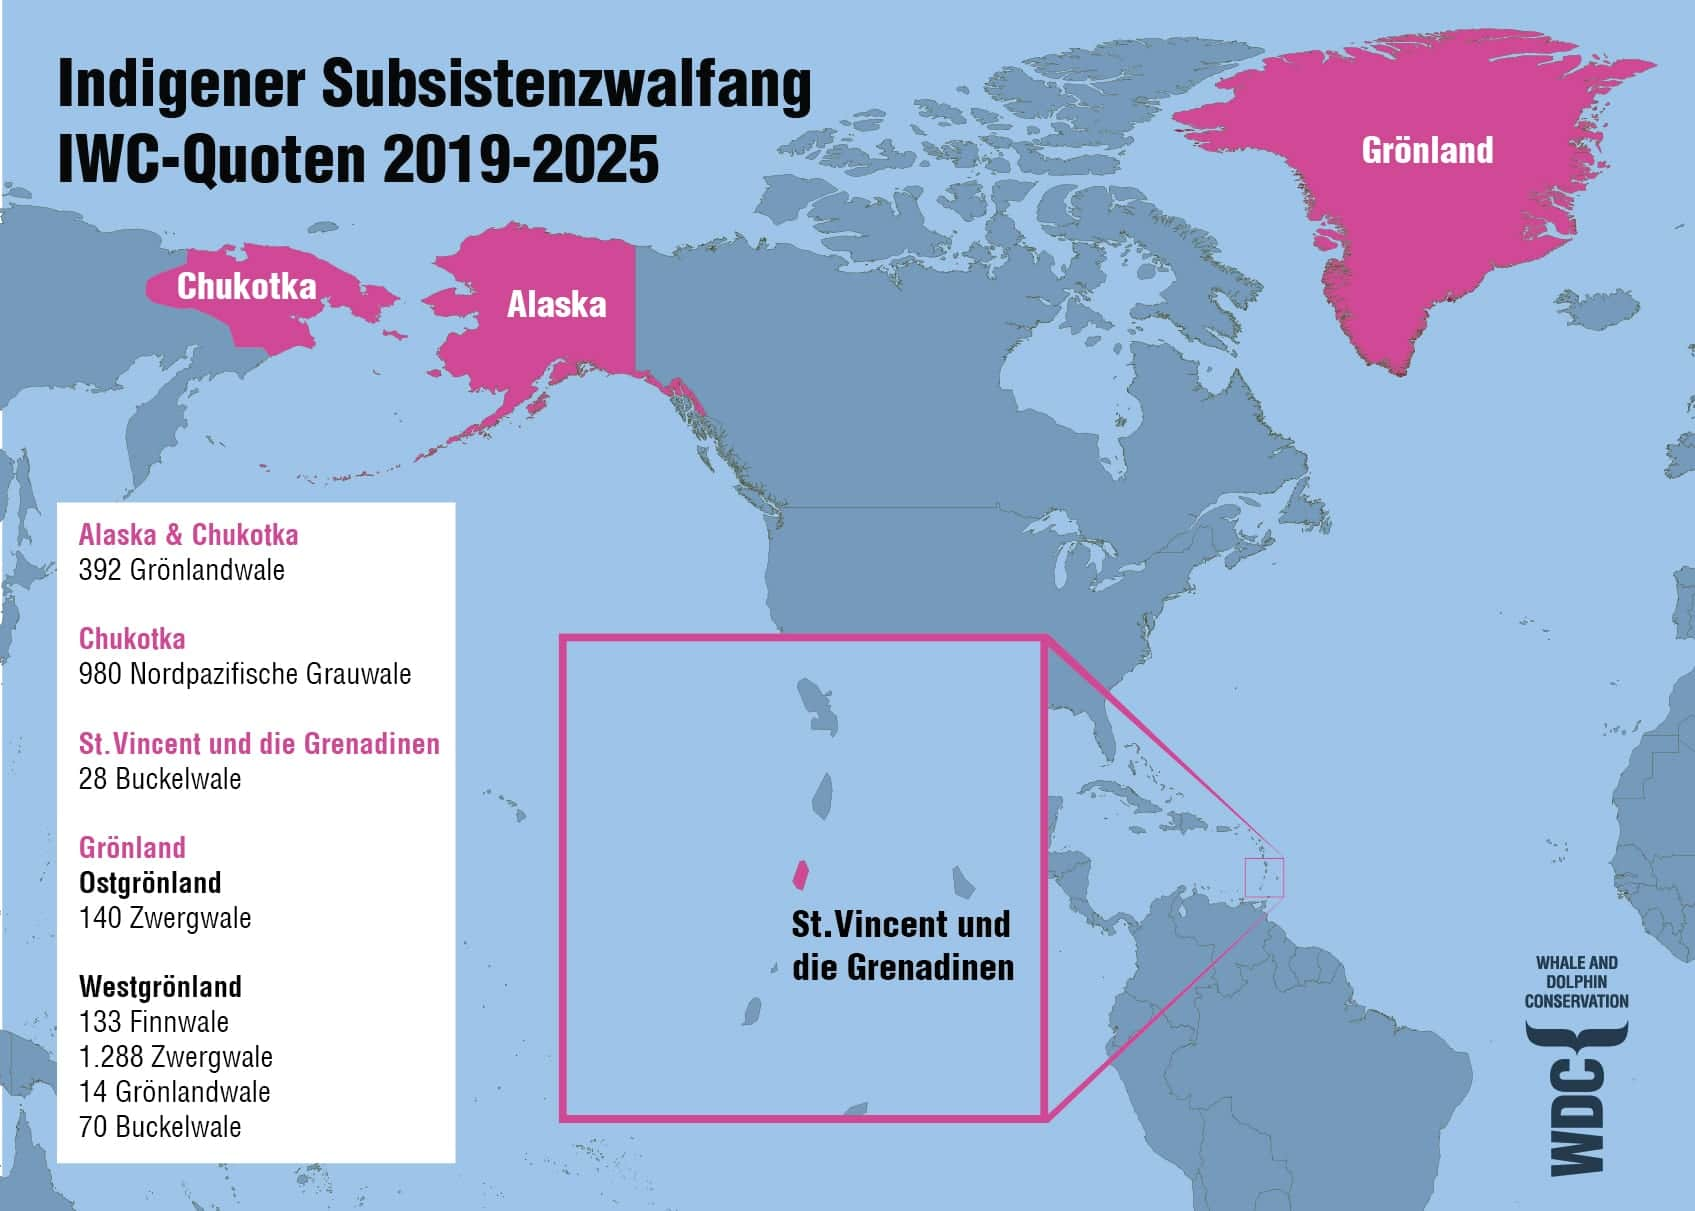 Grafik-Indigener-Subsistenzwalfang-Quoten-IWC